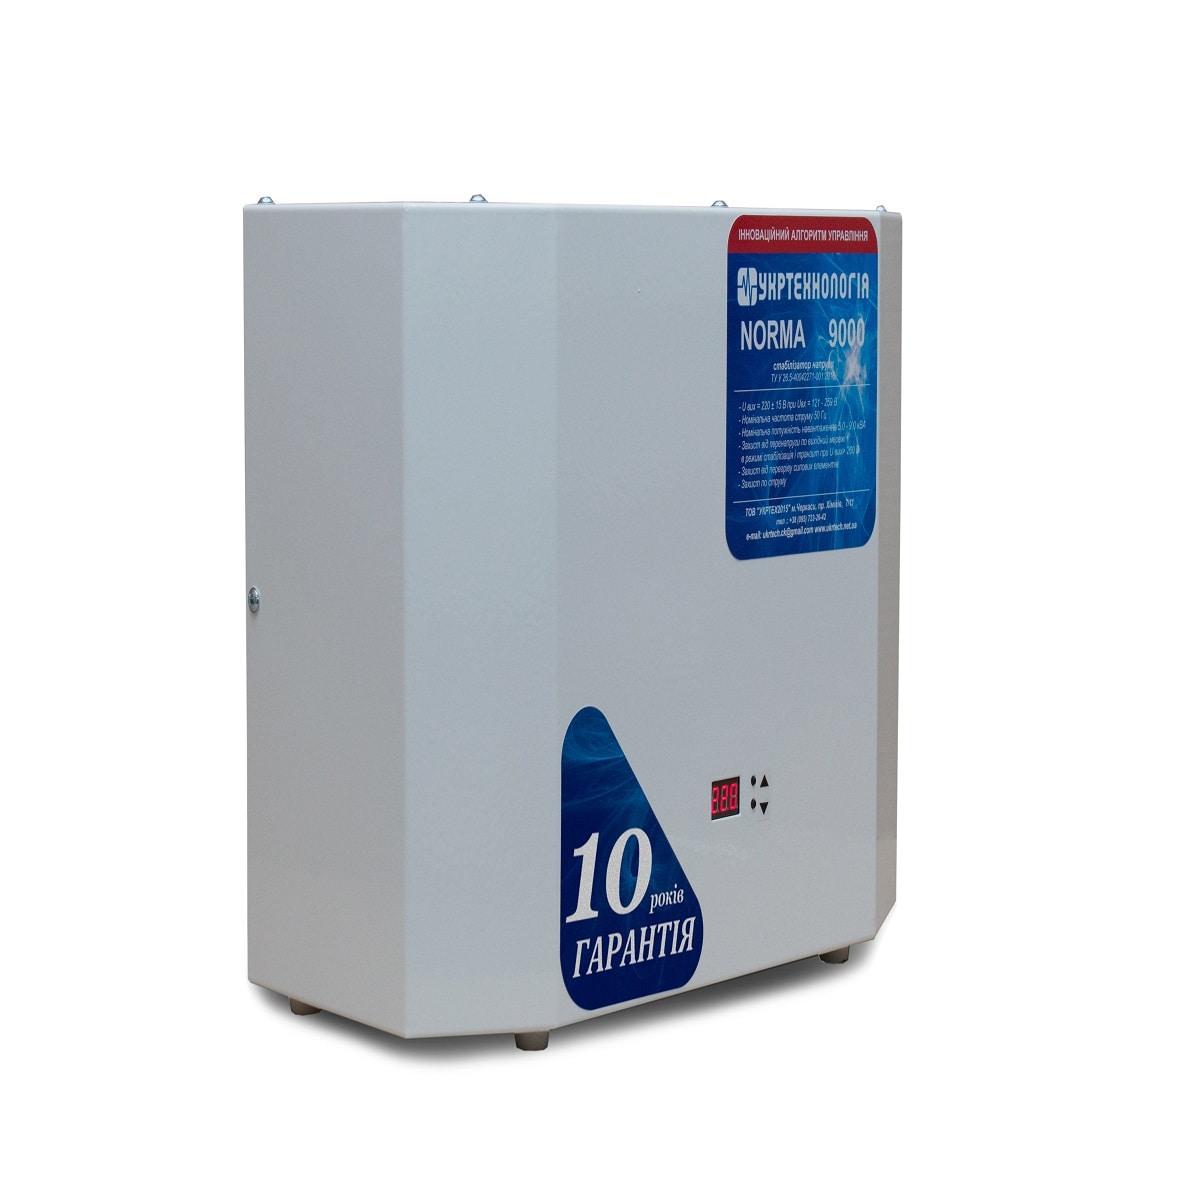 Для дома - Стабилизатор напряжения 9 кВт NORMA 000001376 - Фото 2